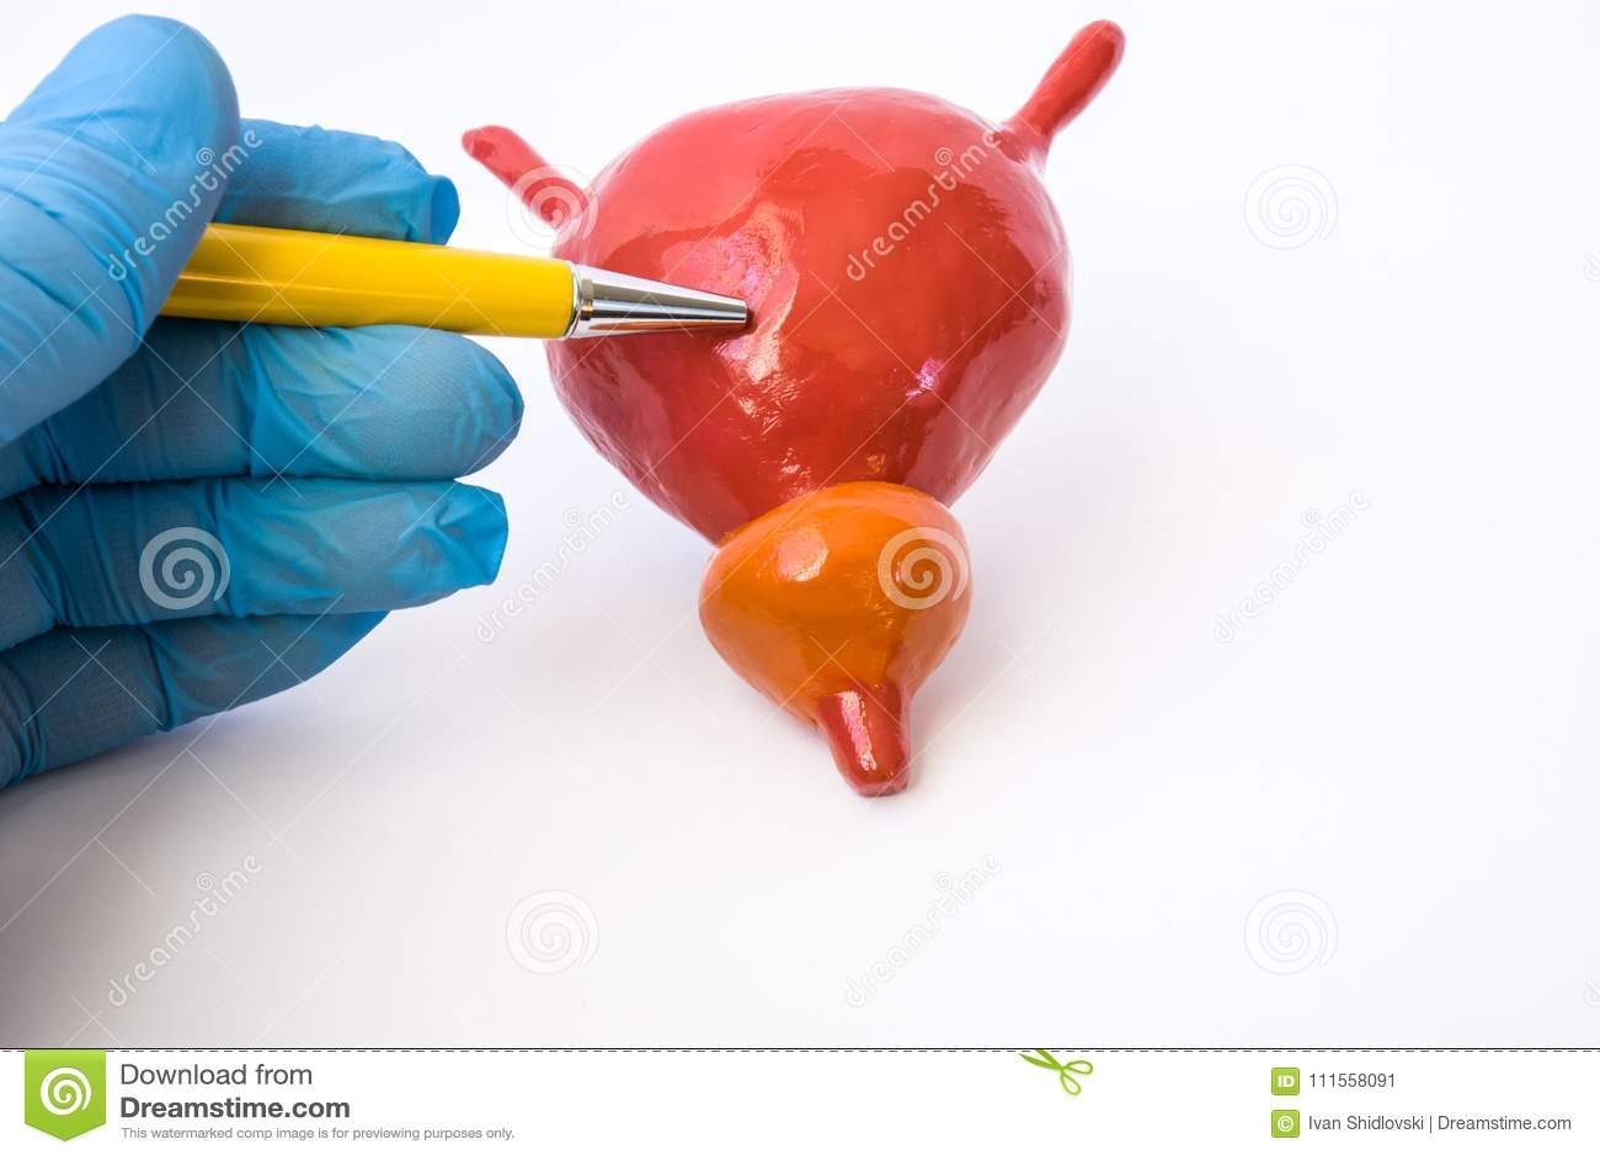 Anatomie Der Prostata Stock Photos - 16 Images